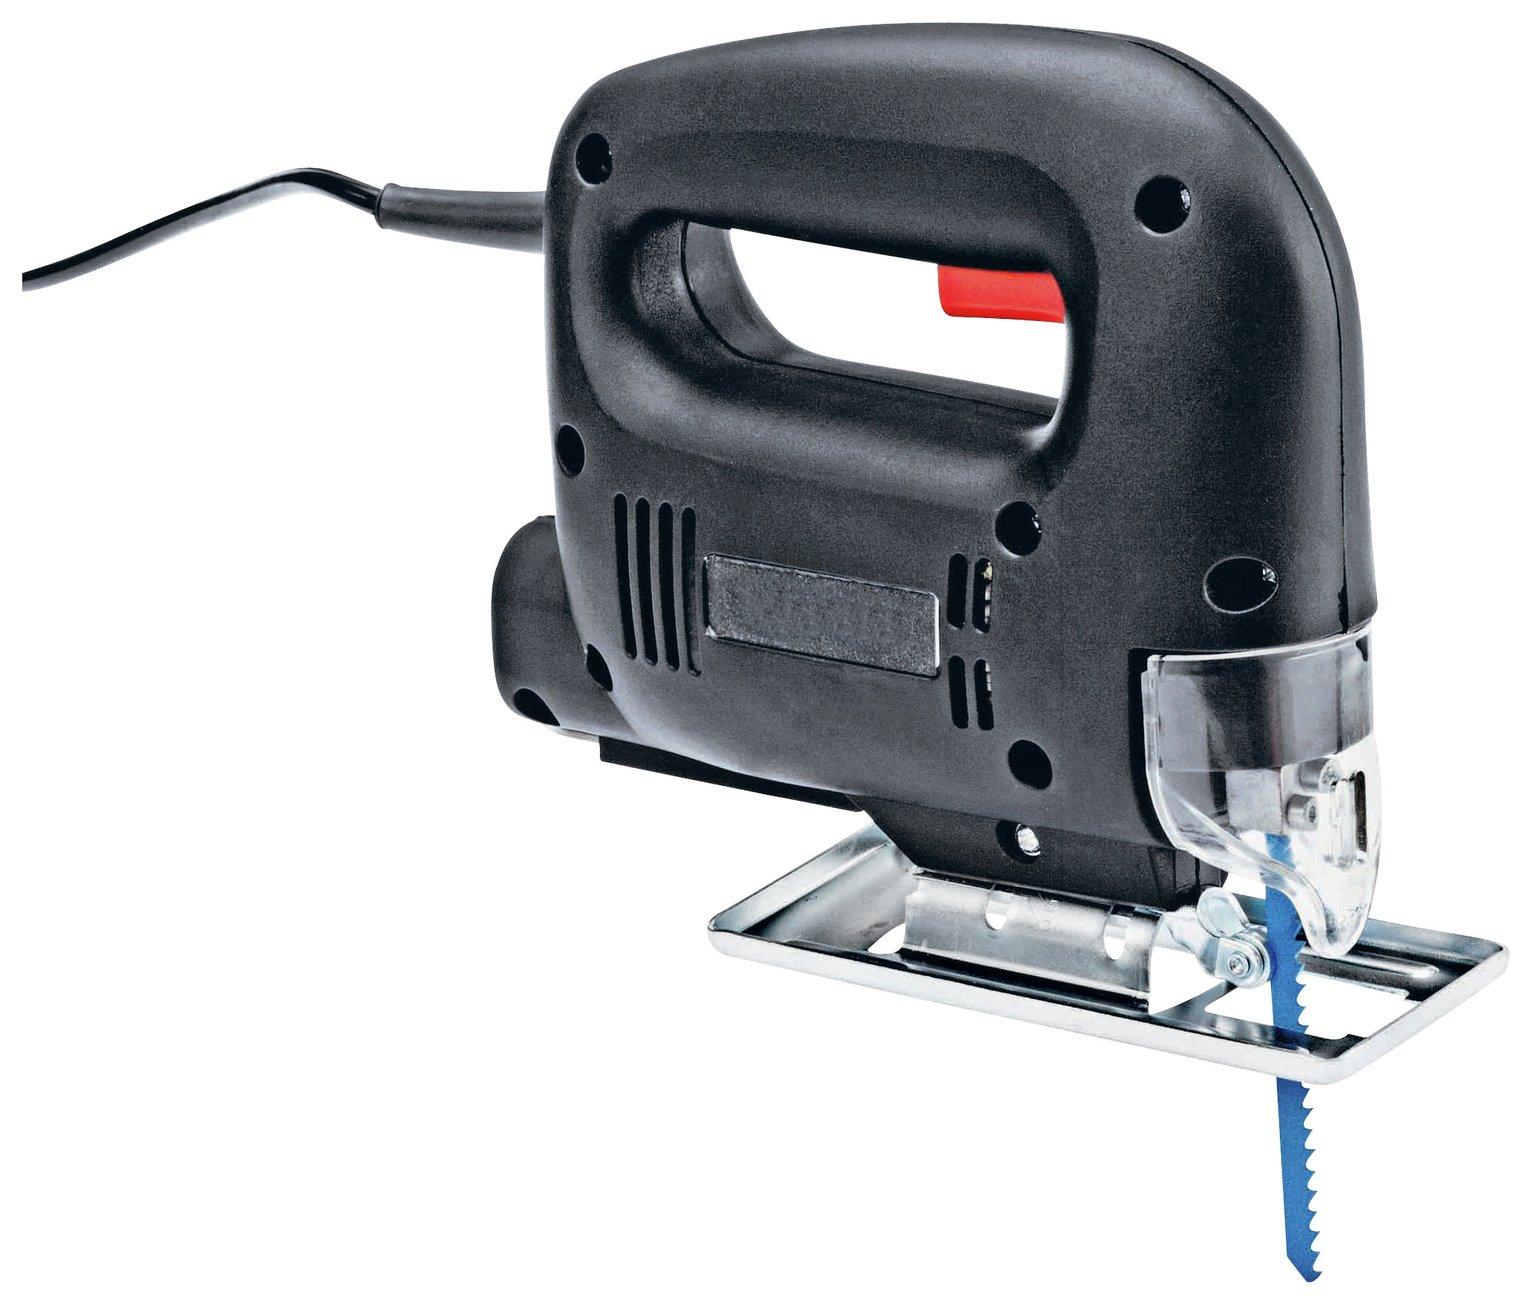 Simple Value Jigsaw - 350W